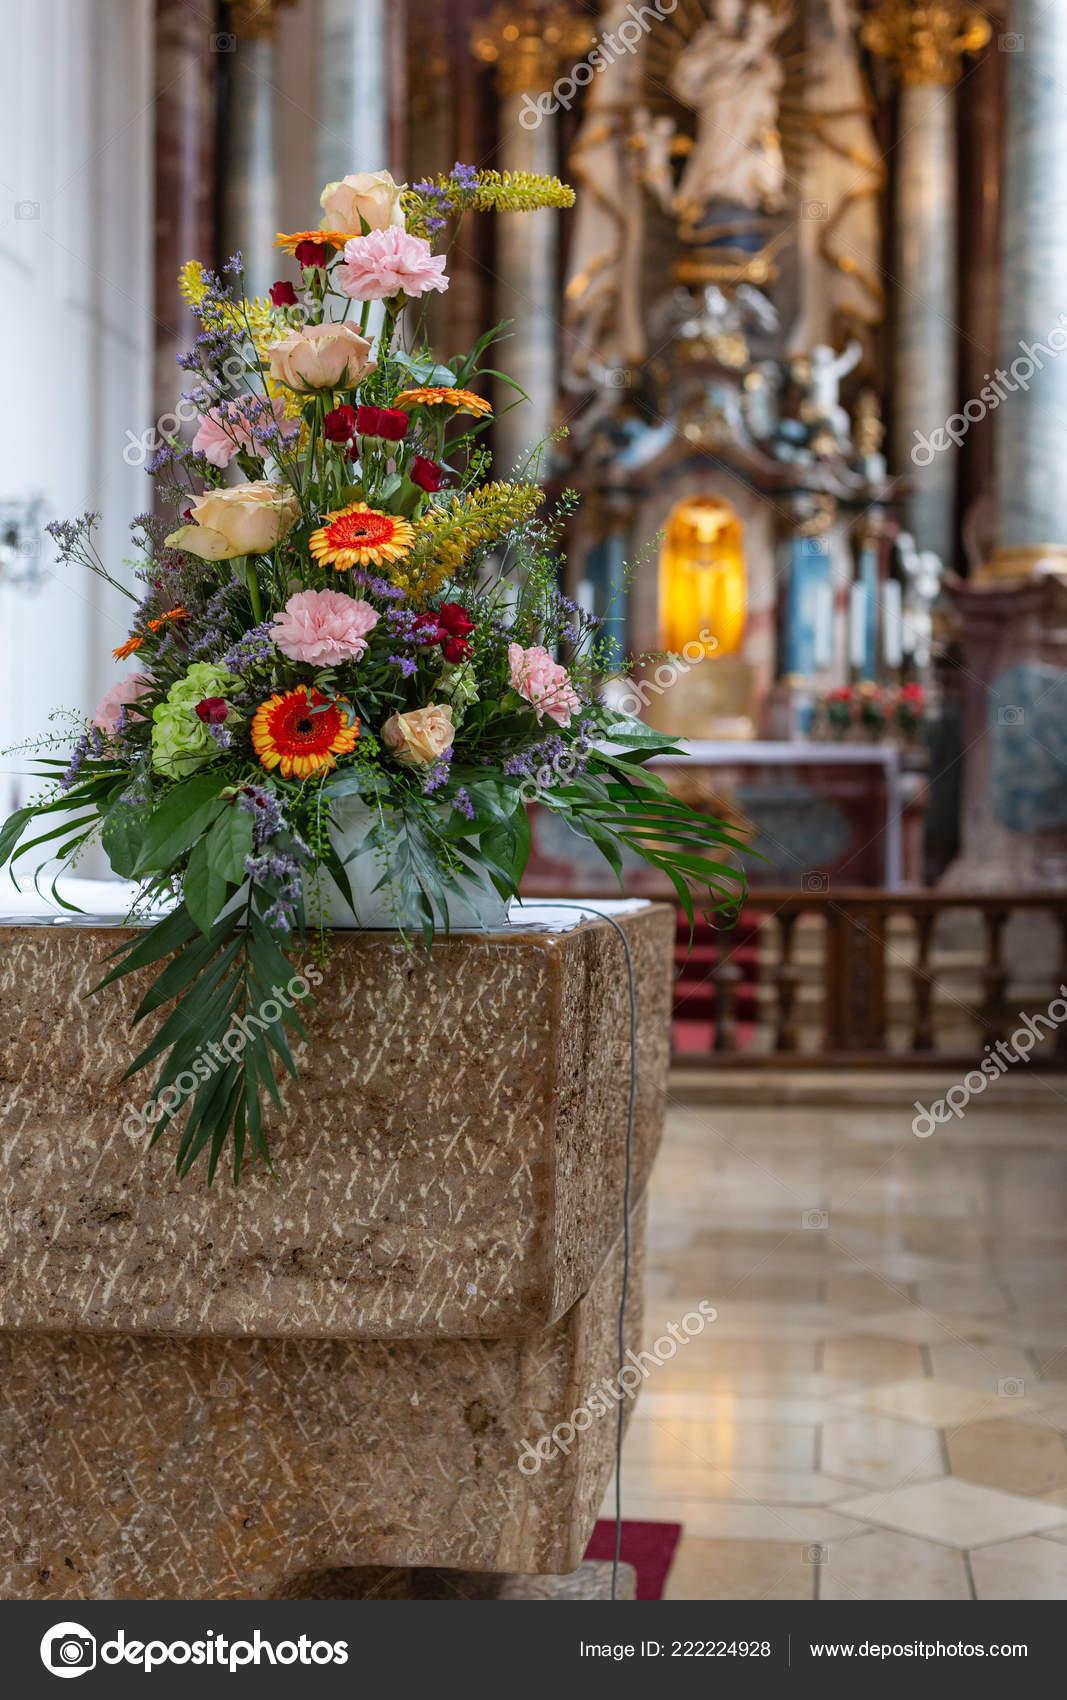 Flower Bouquet Church Altar Historical City South Germany Stock Photo C Rudolfgeiger 222224928